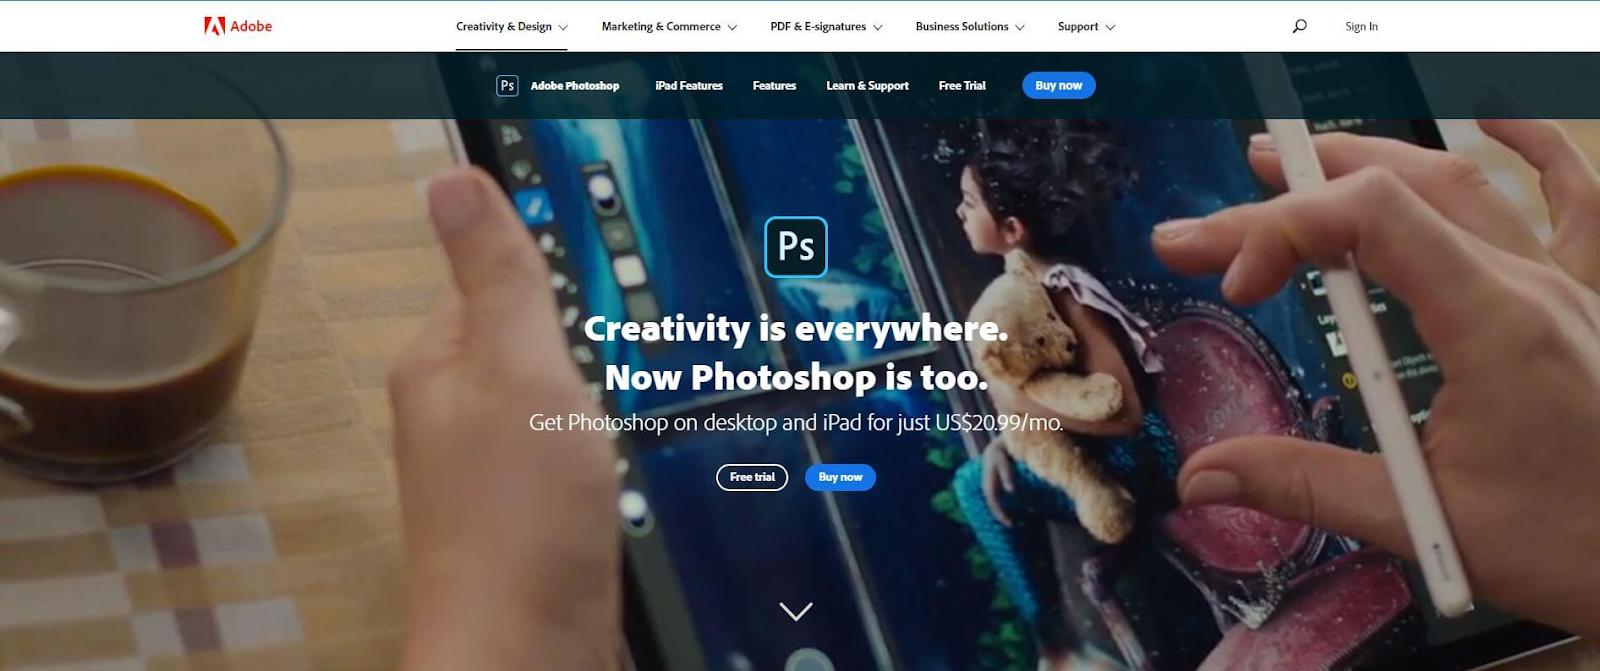 Adobe Product Videos